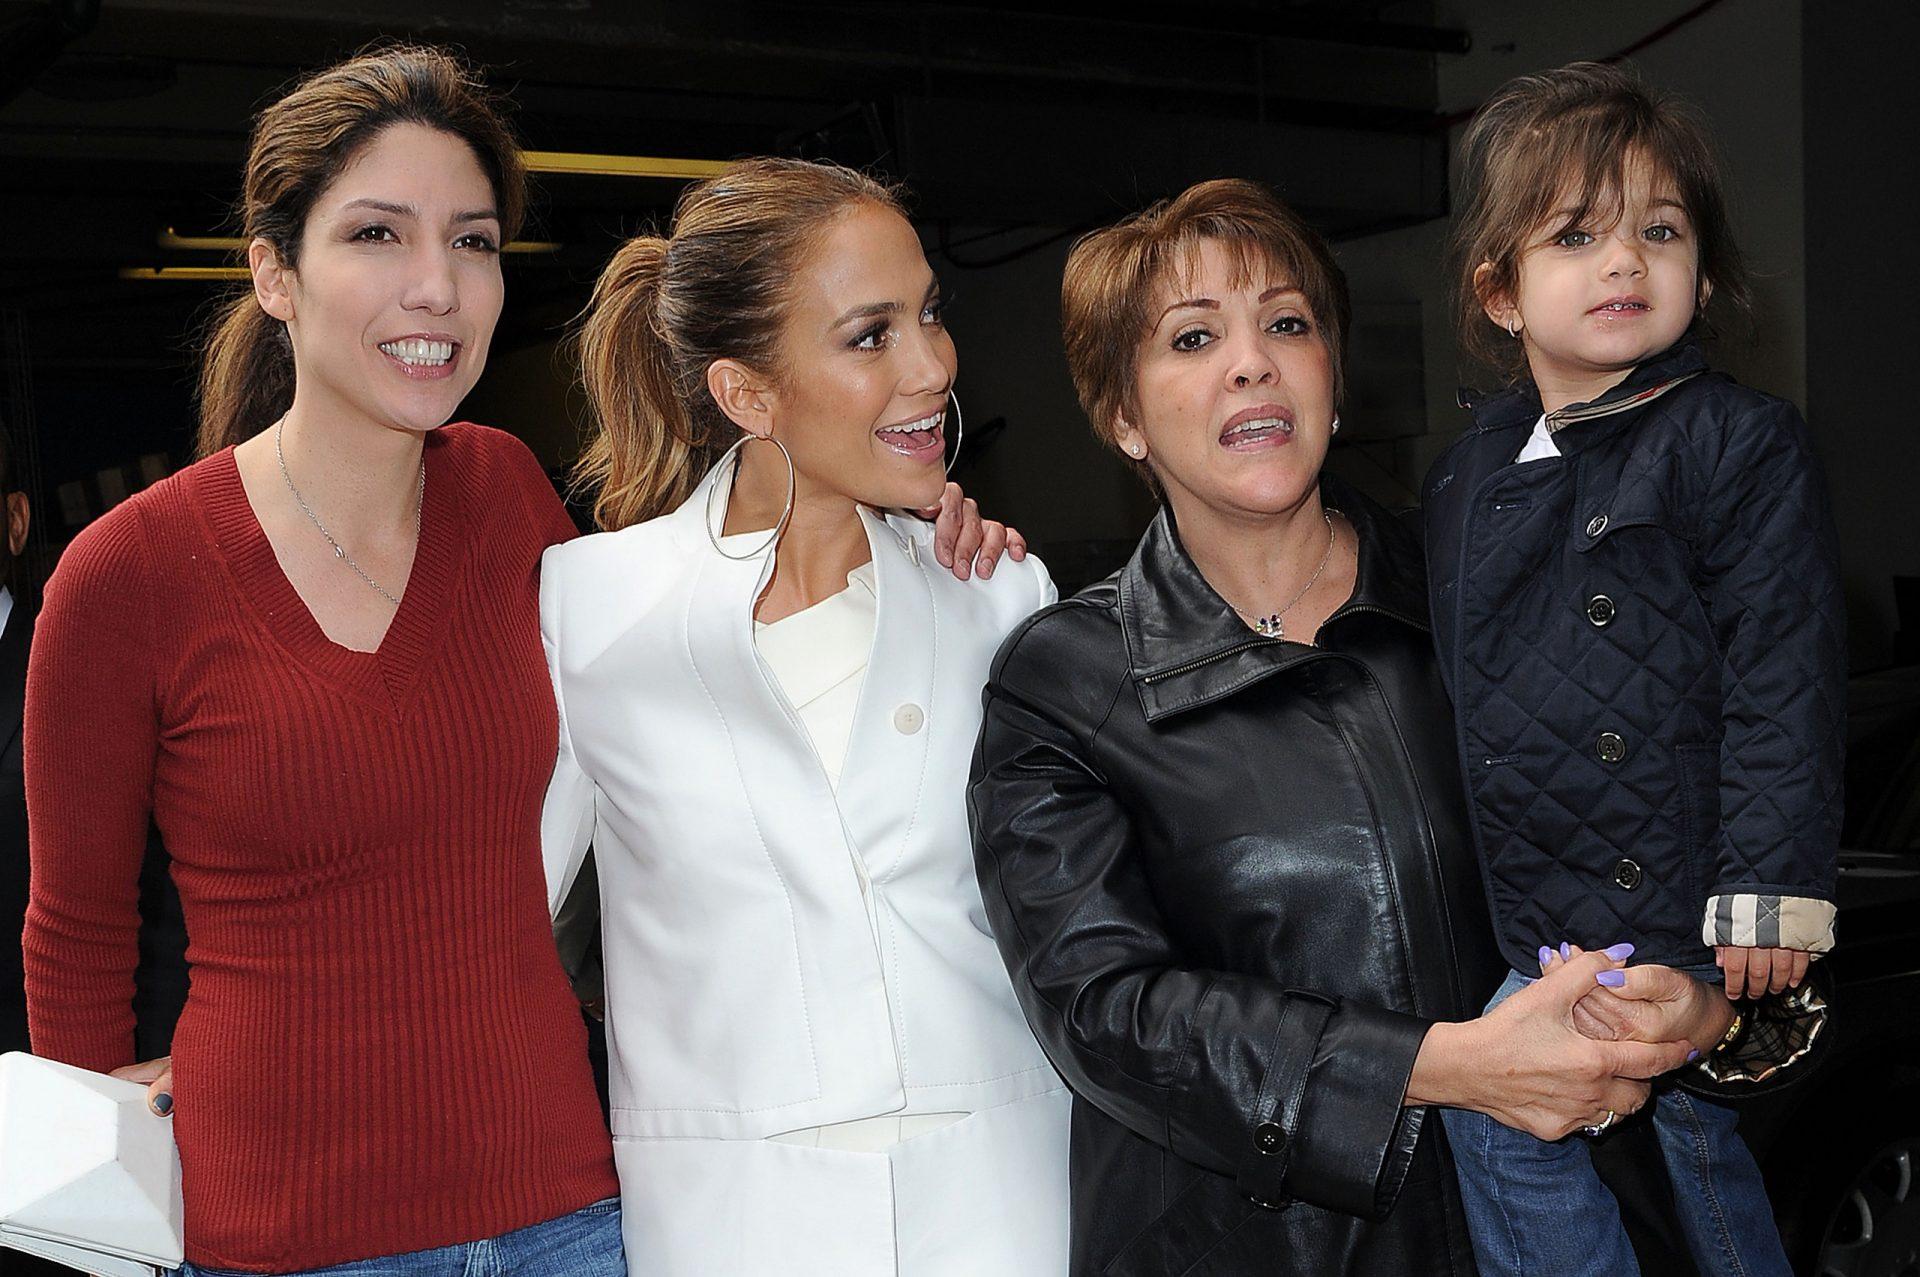 Jennifer Lopez Family Photos, Husband, Kids, Age, Height